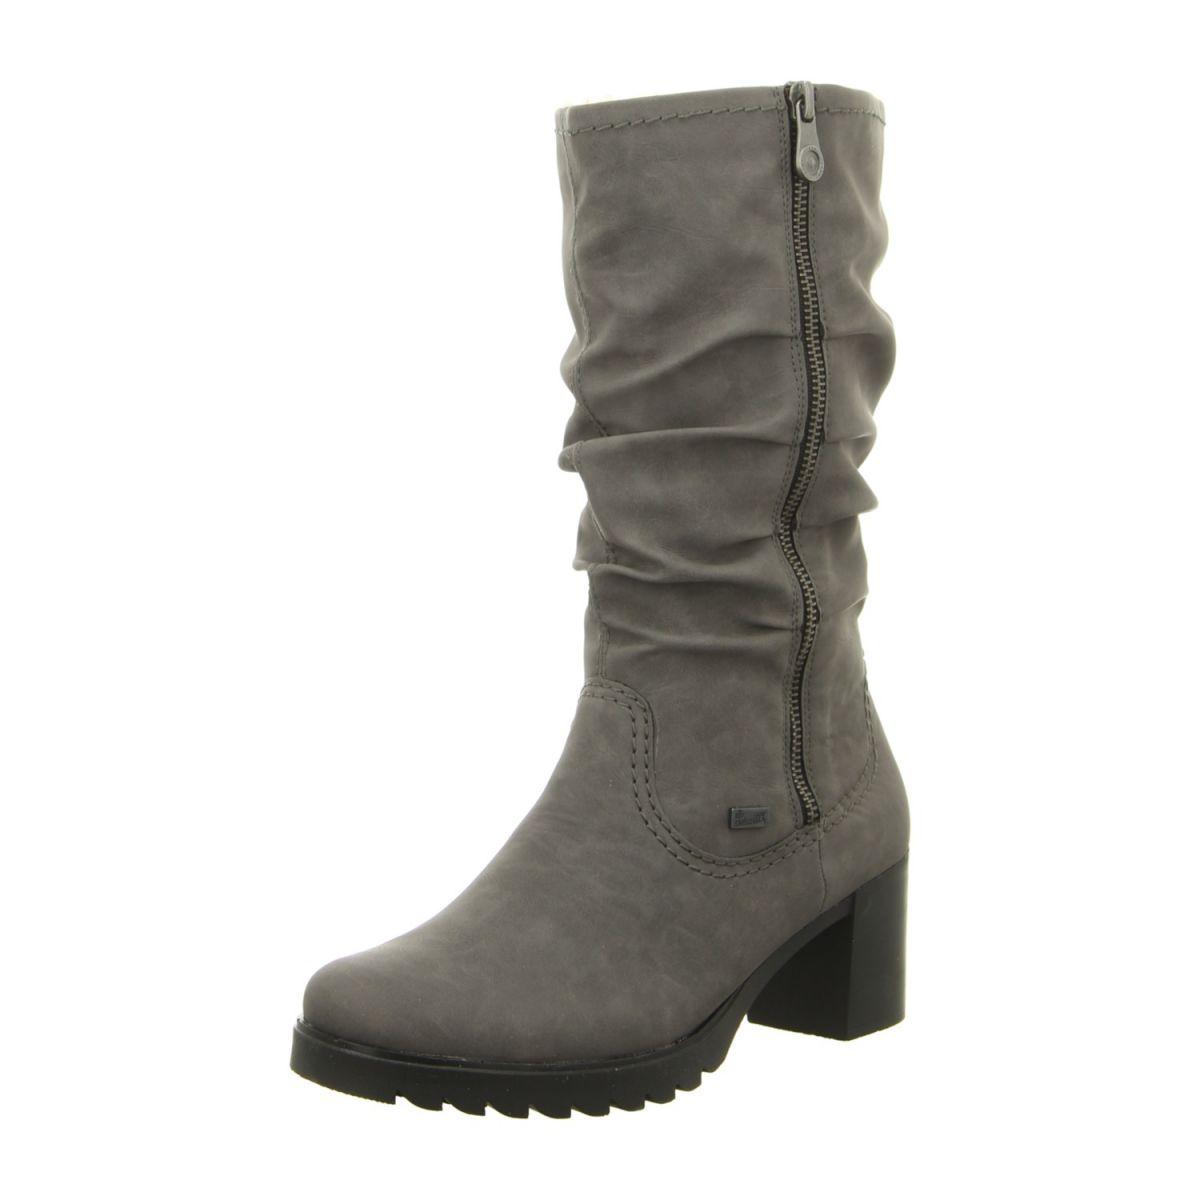 b072e9d6931d NEU  Rieker Stiefel Y8739-42 - grau -   Schuhe   Accessoires ...